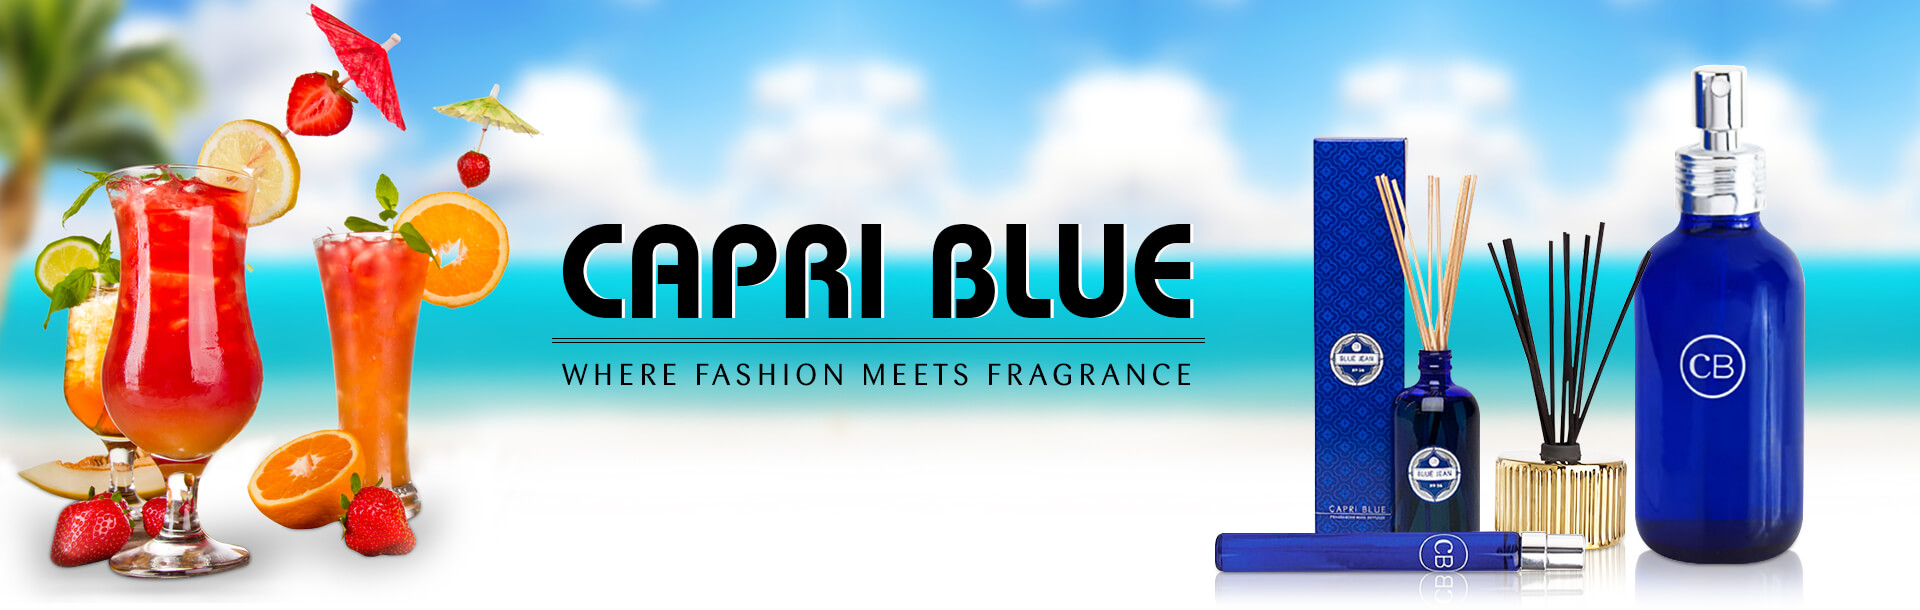 Capri Blue Collection